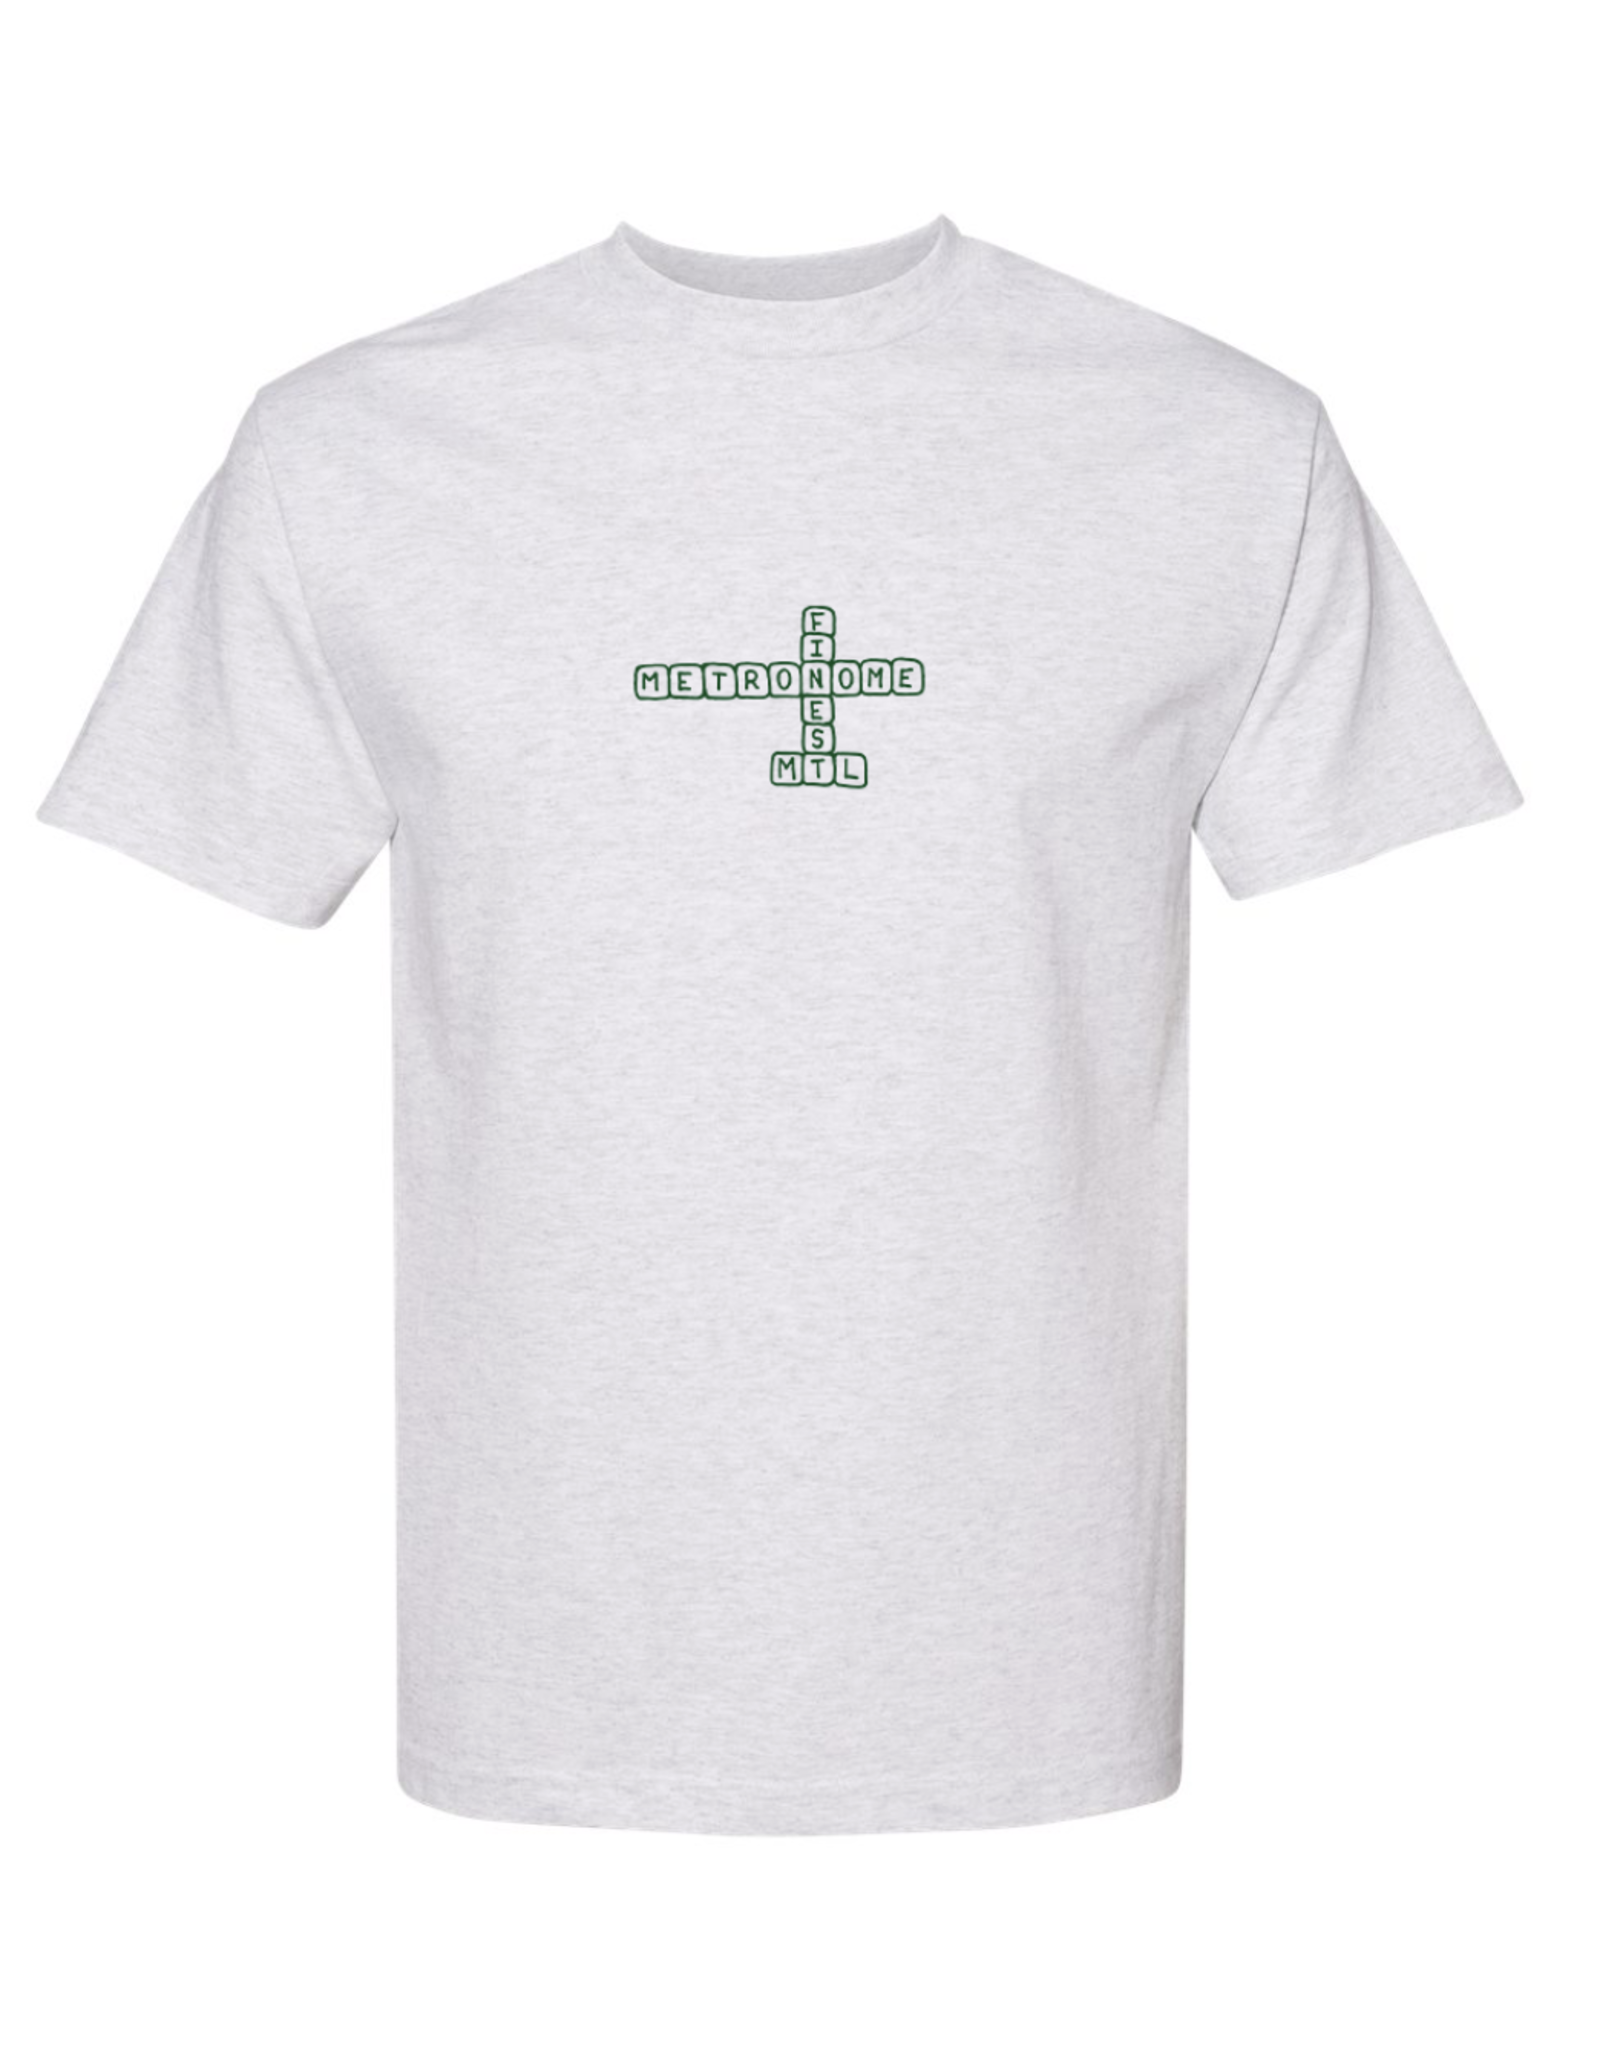 Metronome Scrabble logo T-Shirt - Ash Grey